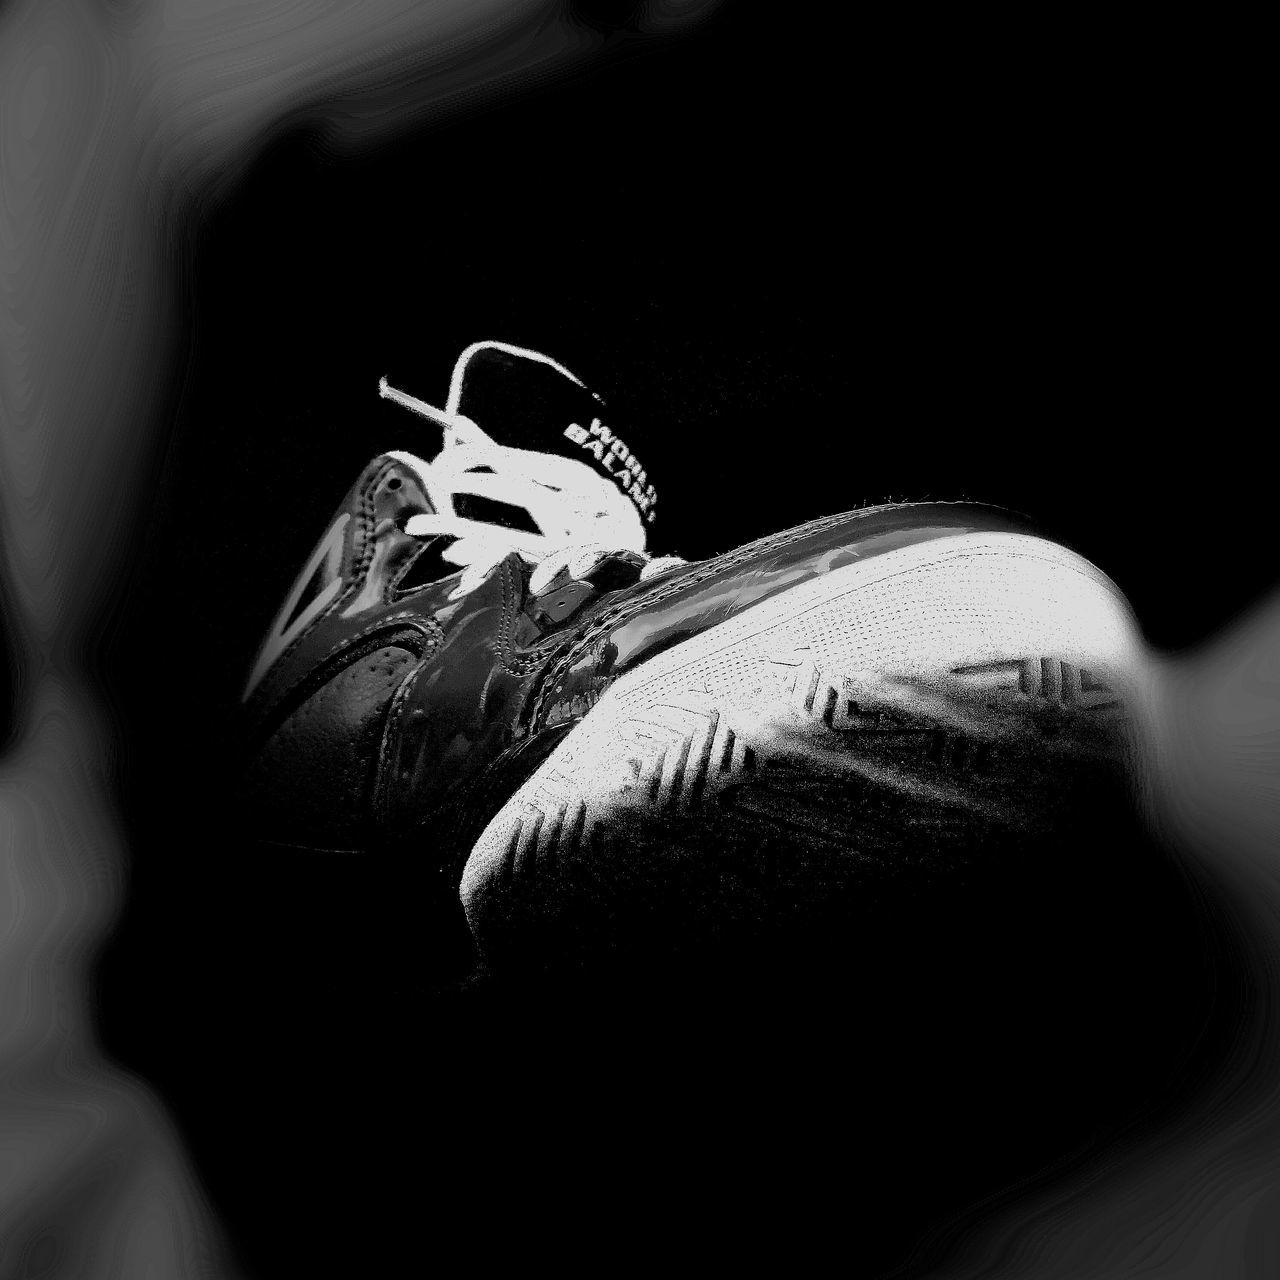 Worldbalanceph Rubbershoes Black&white Blackandwhitephotography Blackandwhitephoto